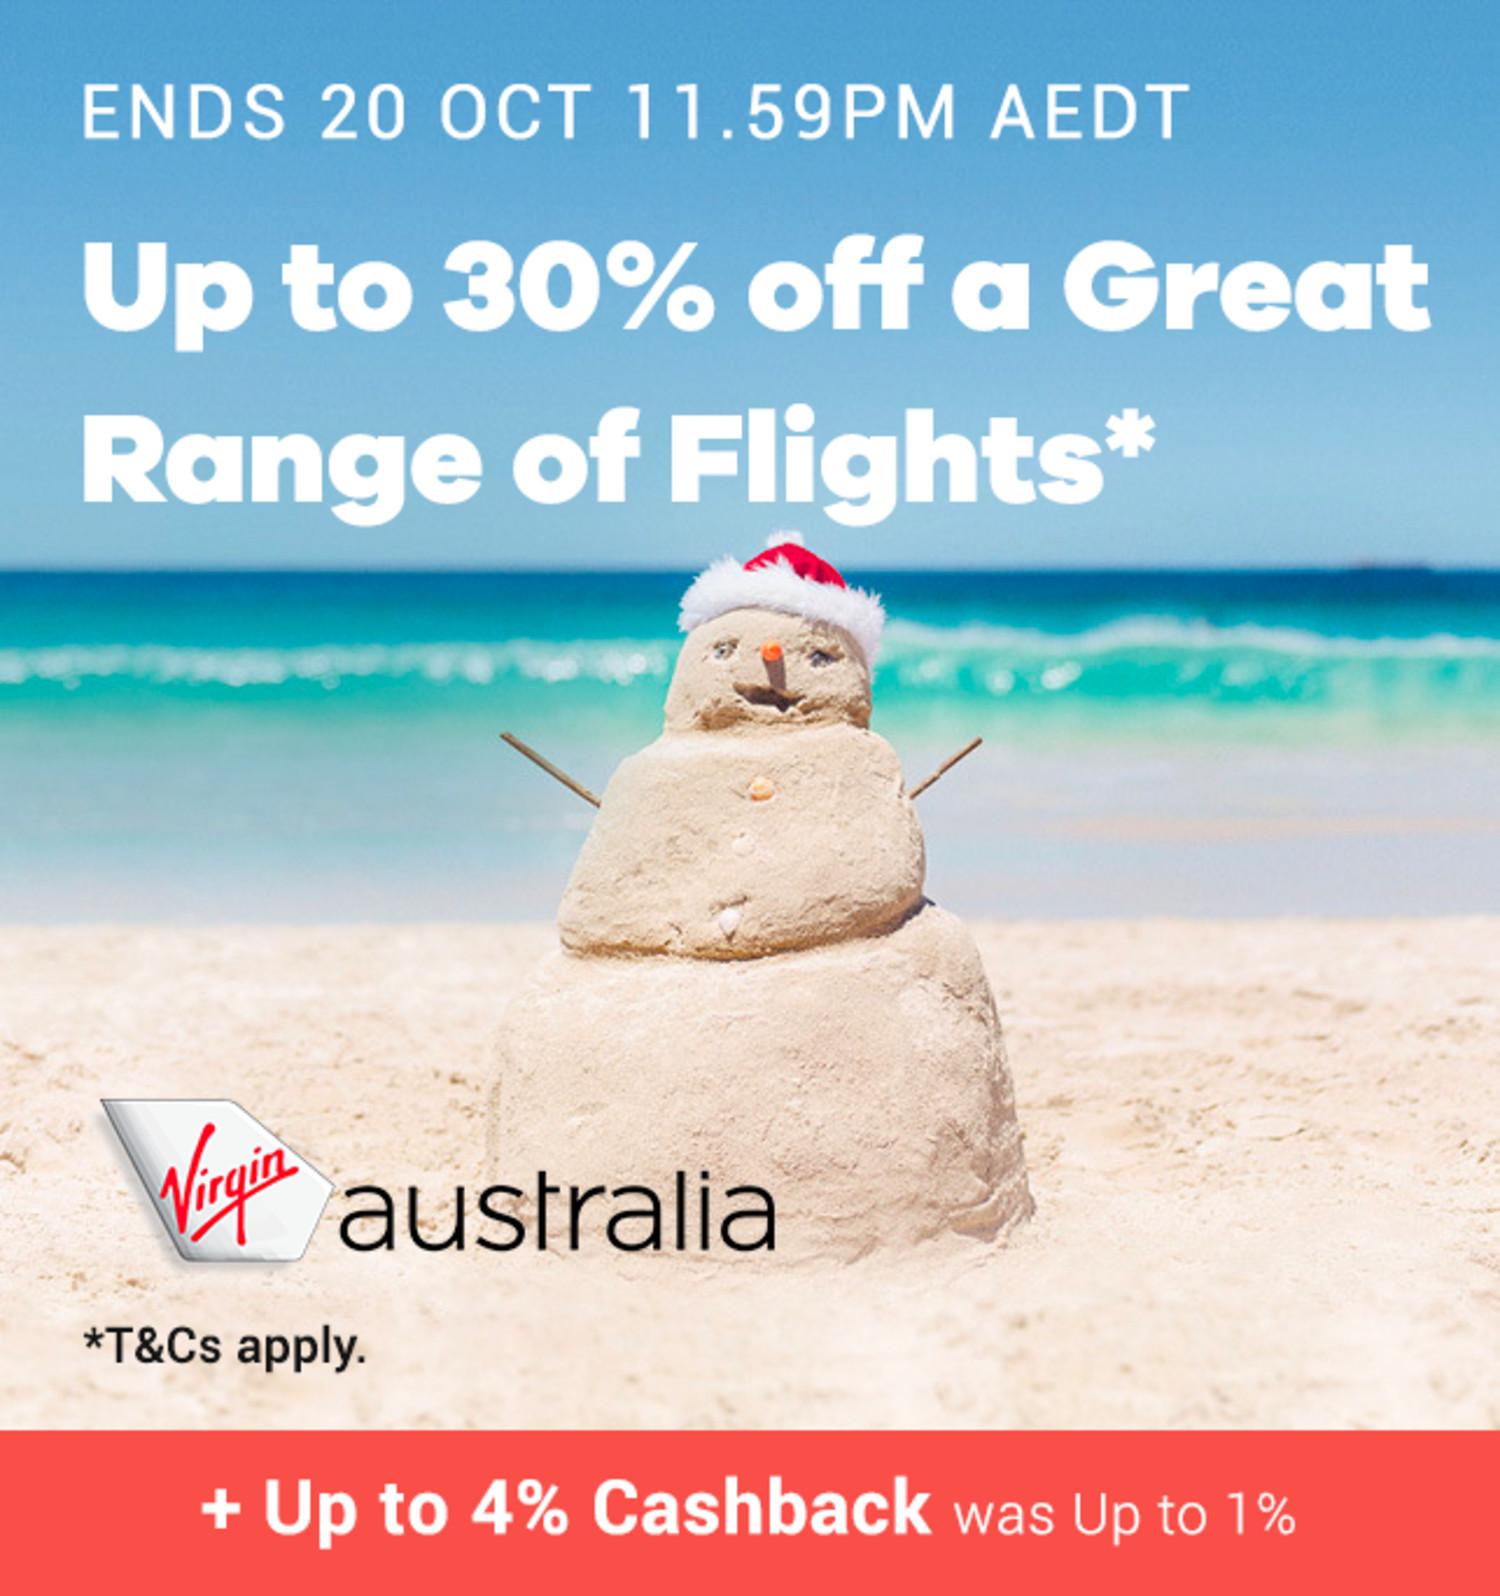 Virgin Australia Flights - Up to 4% Upsized Cashback